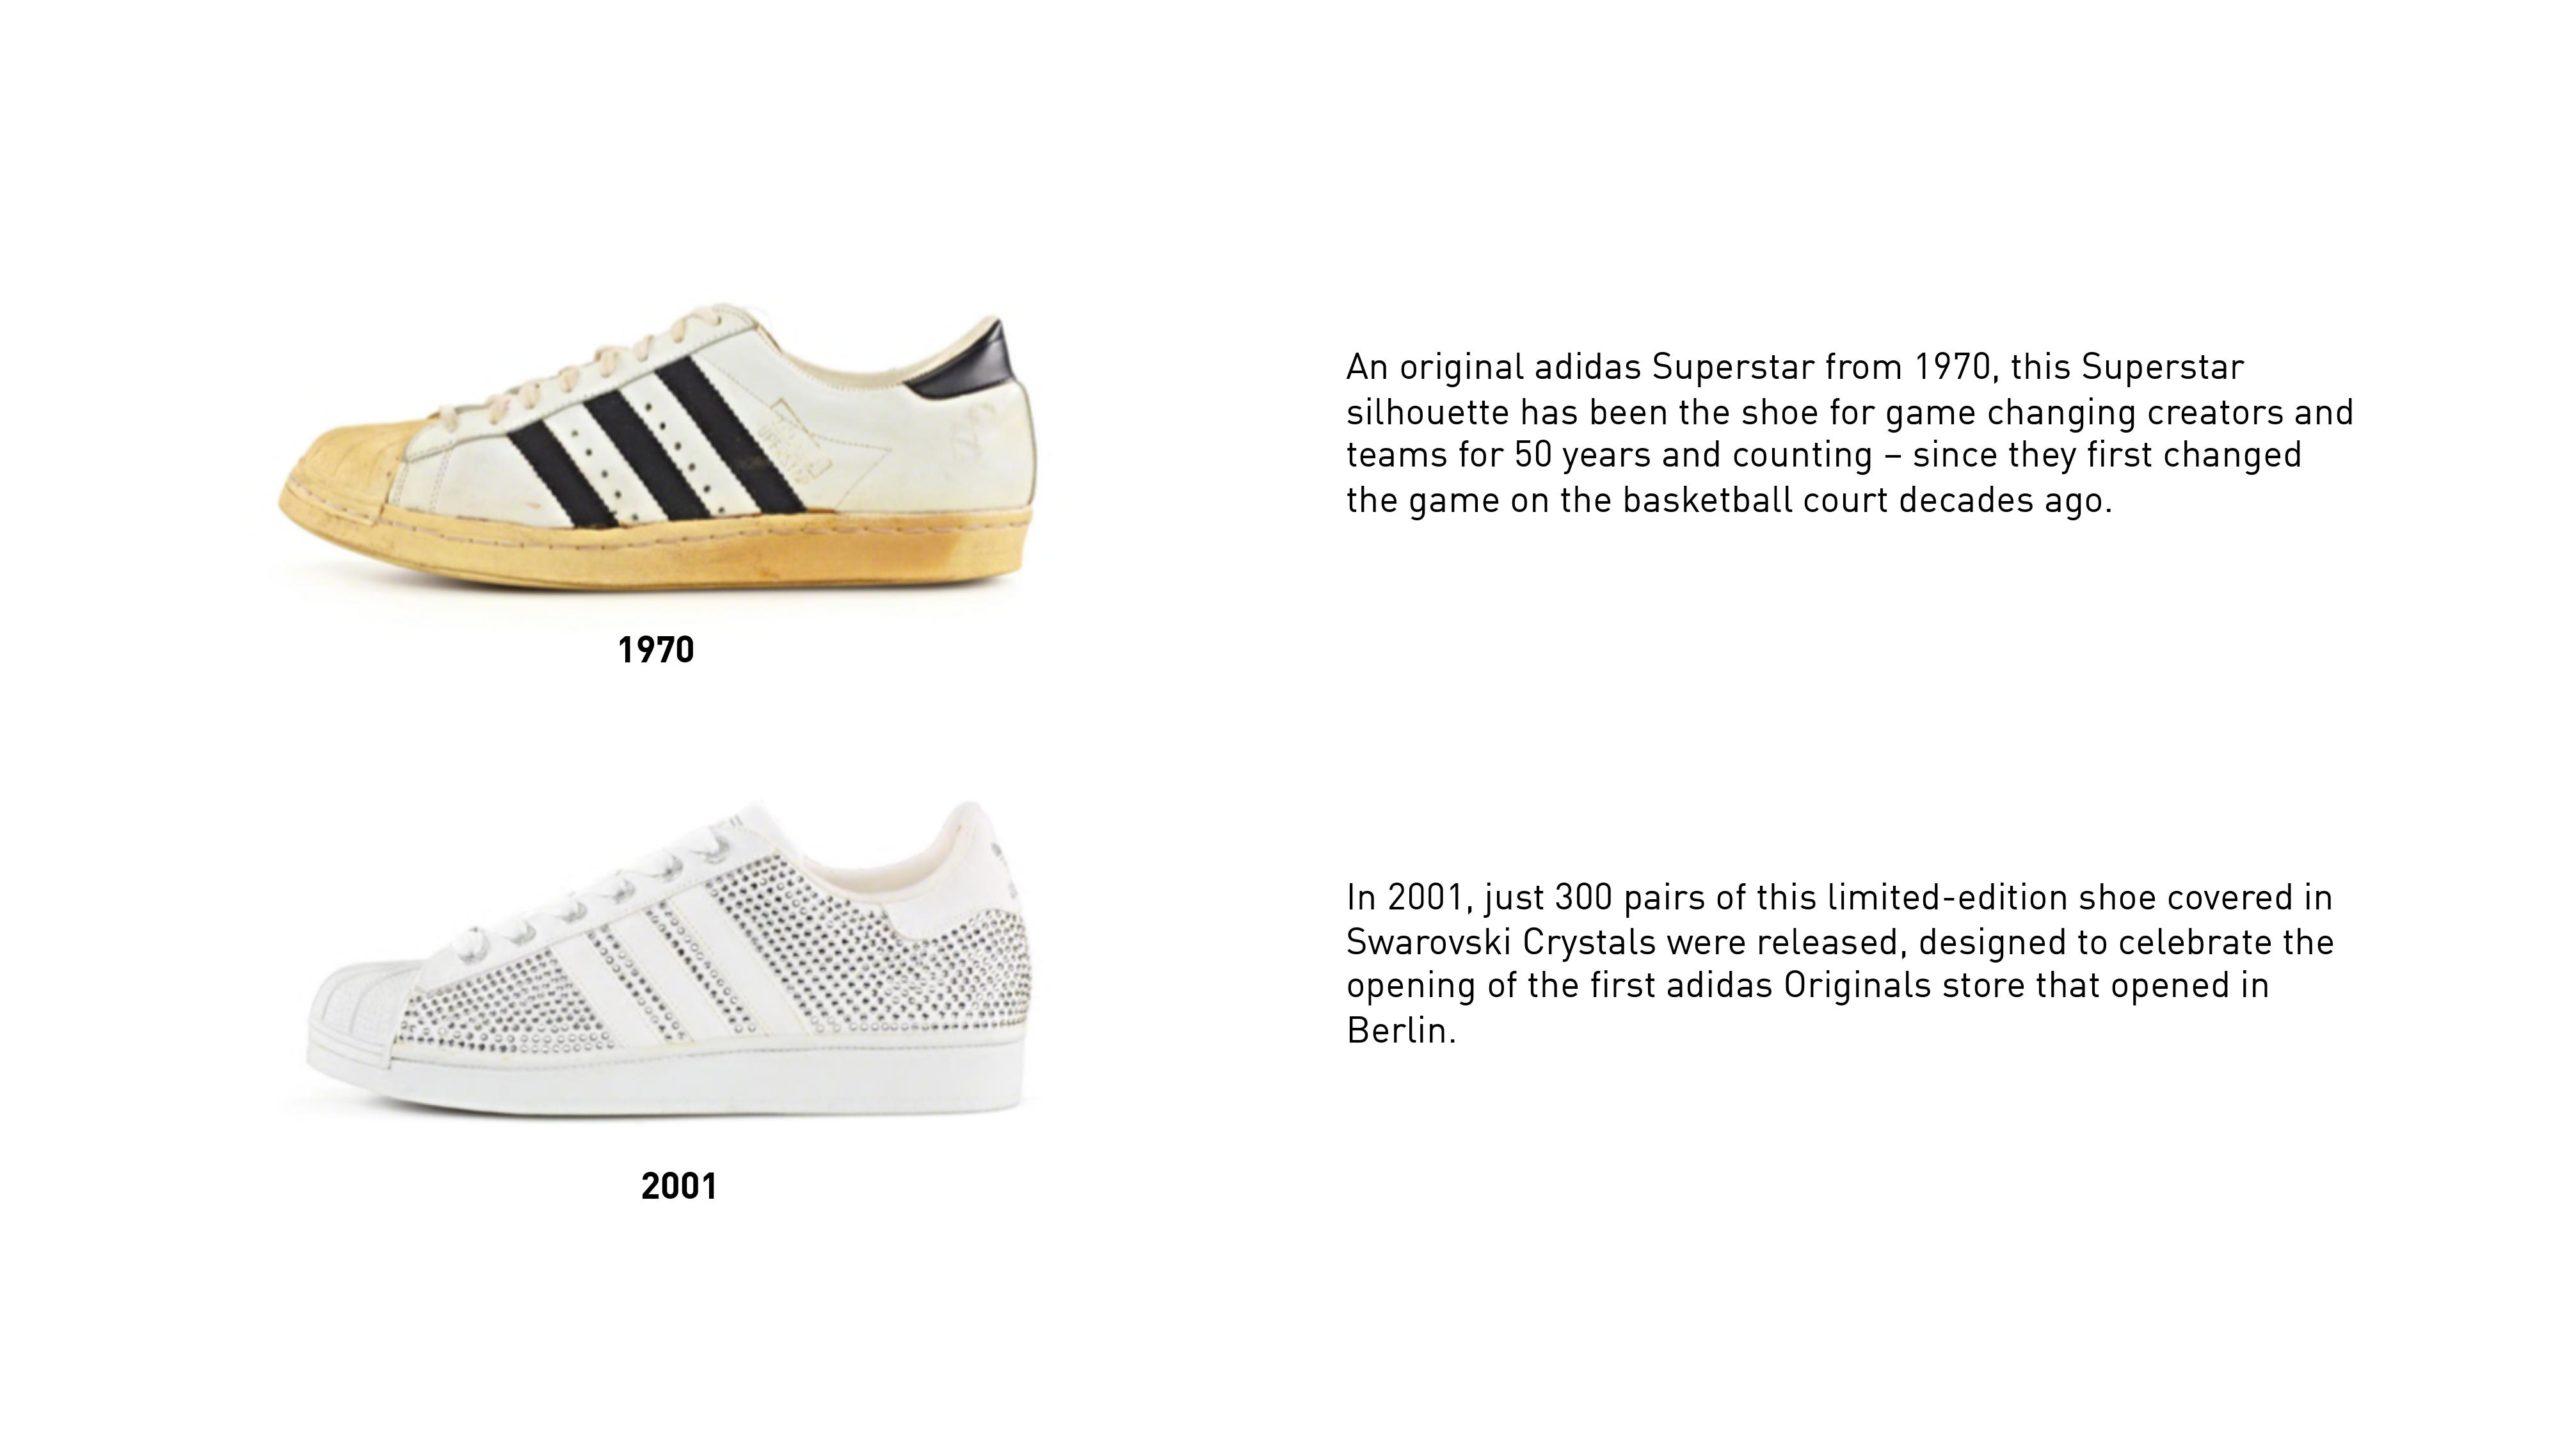 Identidad ganador hoy  adidas Originals Highlights 50 Years Of adidas Superstar – PAUSE Online |  Men's Fashion, Street Style, Fashion News & Streetwear